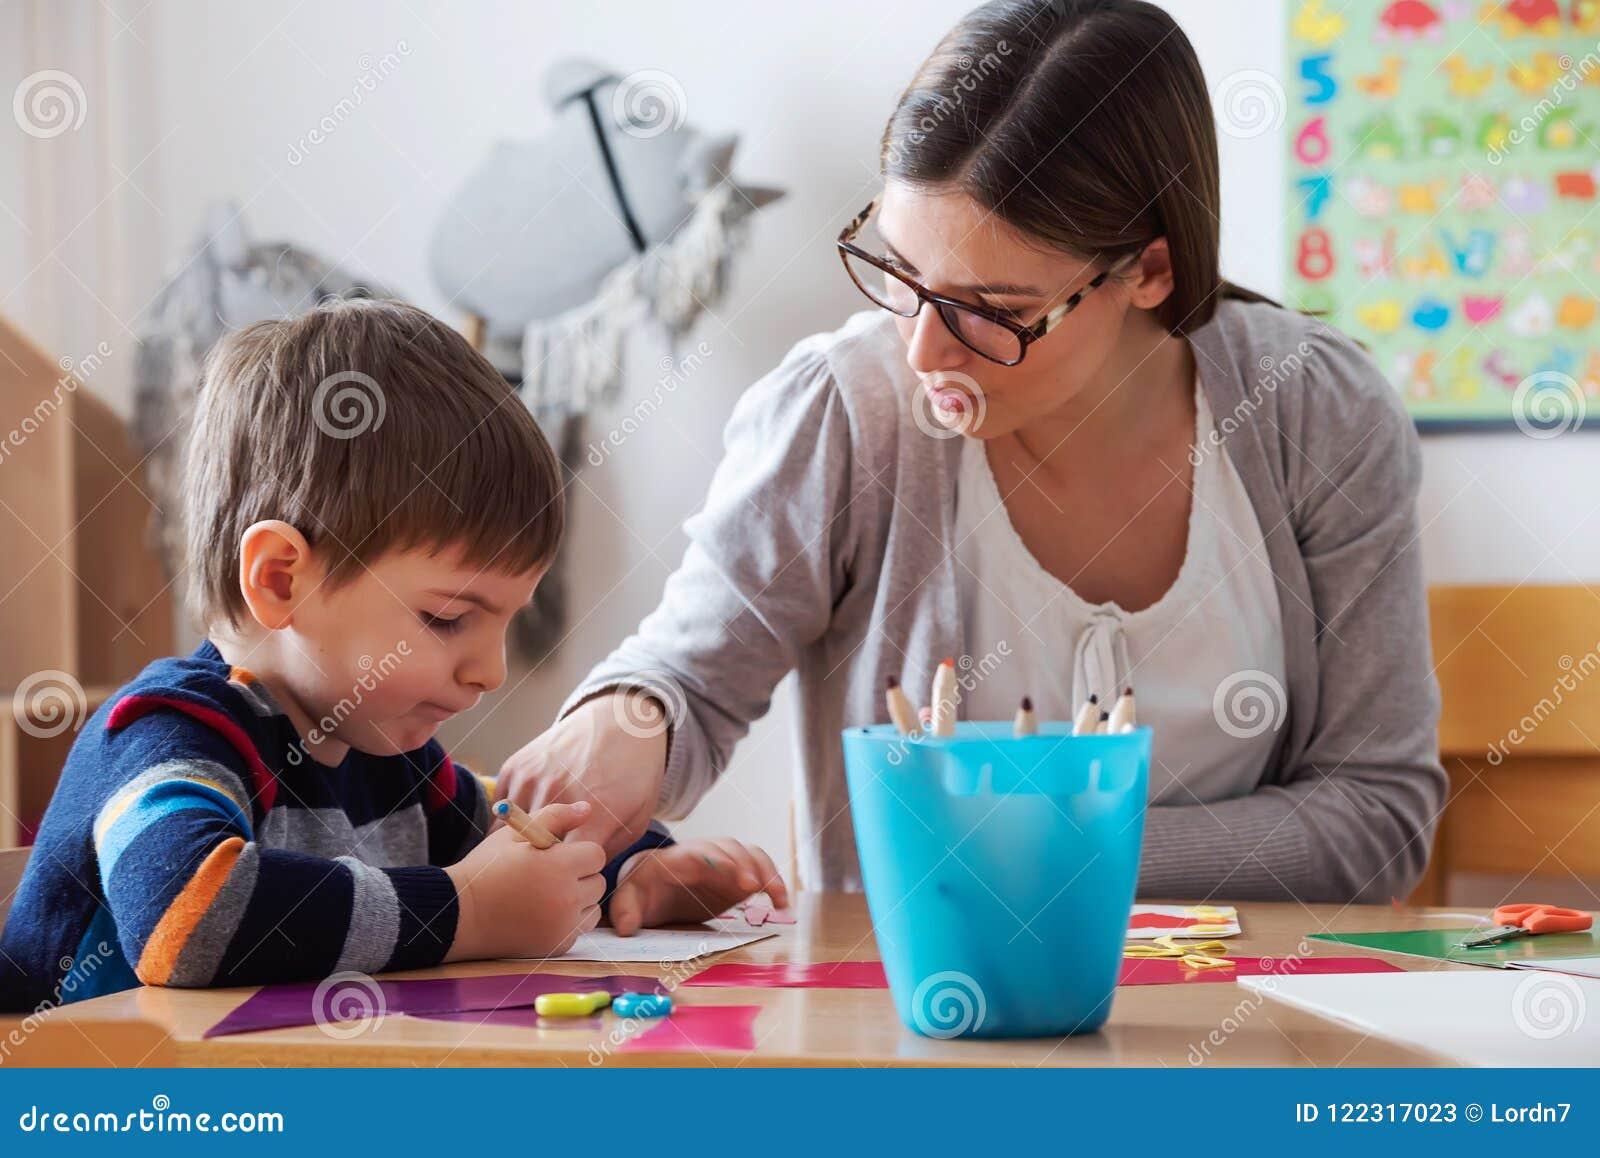 Vorschullehrer mit Kind am Kindergarten - kreativer Art Class